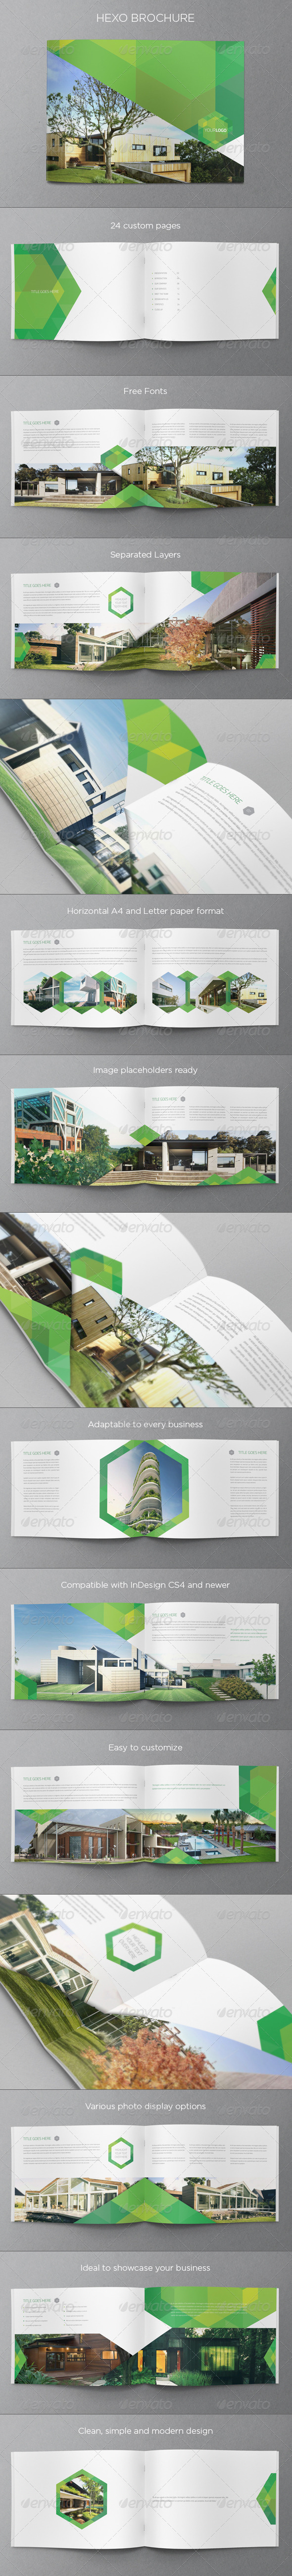 GraphicRiver Real Estate Ecologic Brochure 5879542